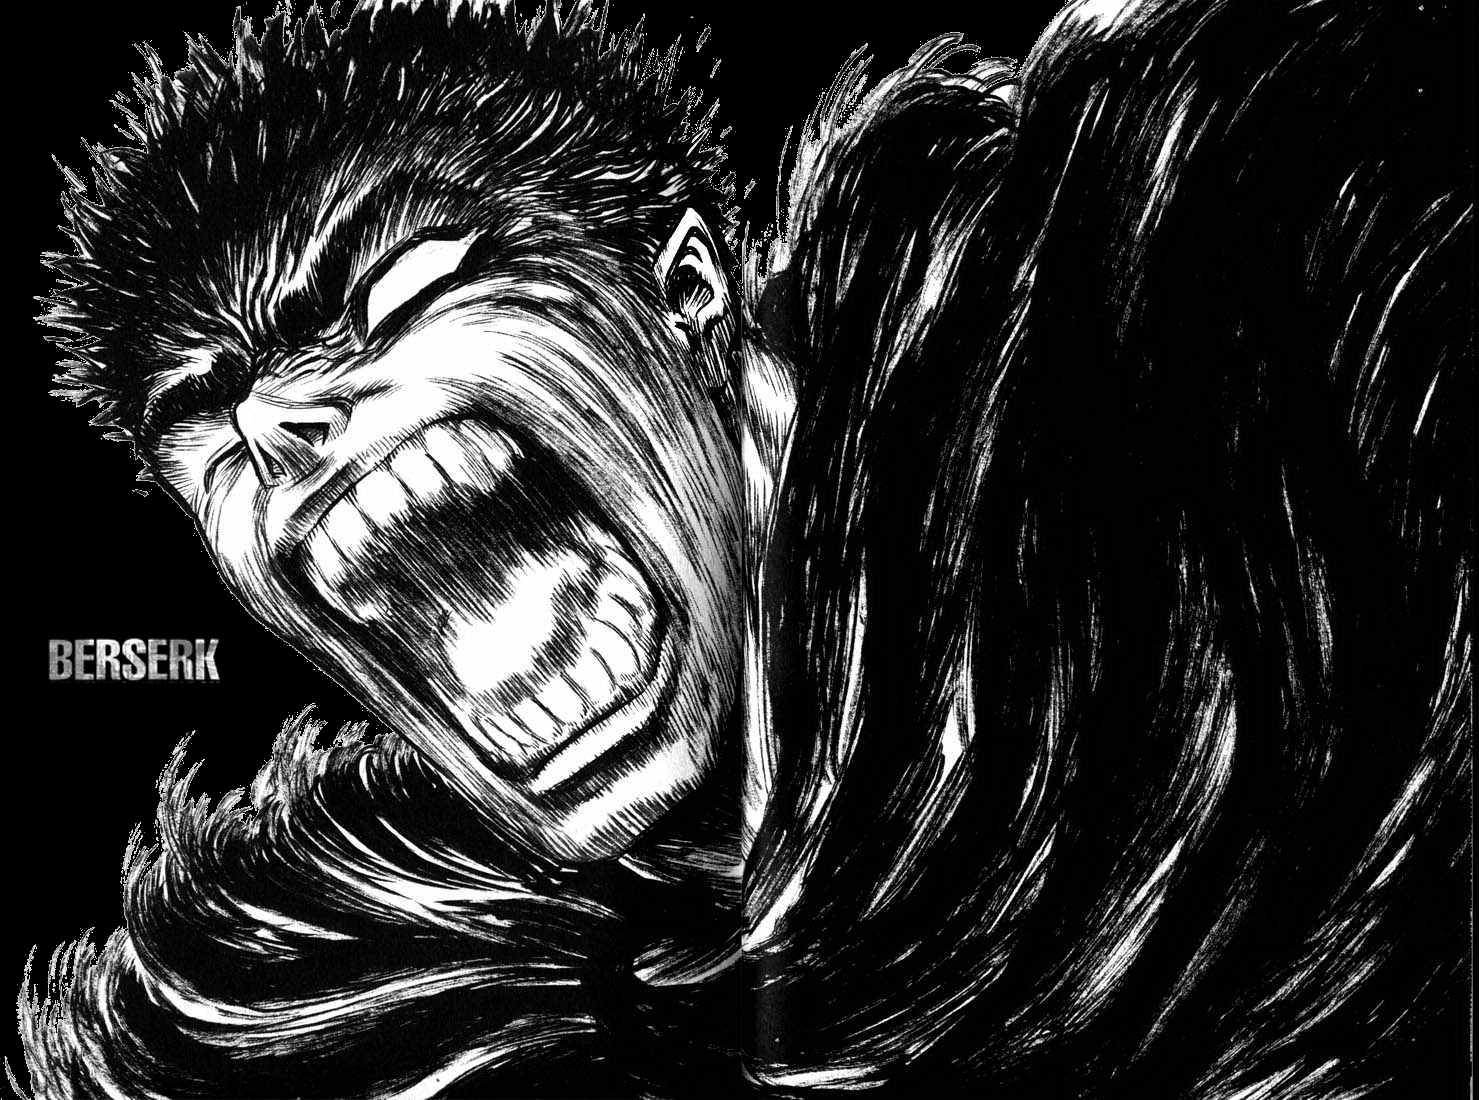 Berserk Guts Manga wallpaper   ForWallpapercom 1479x1100